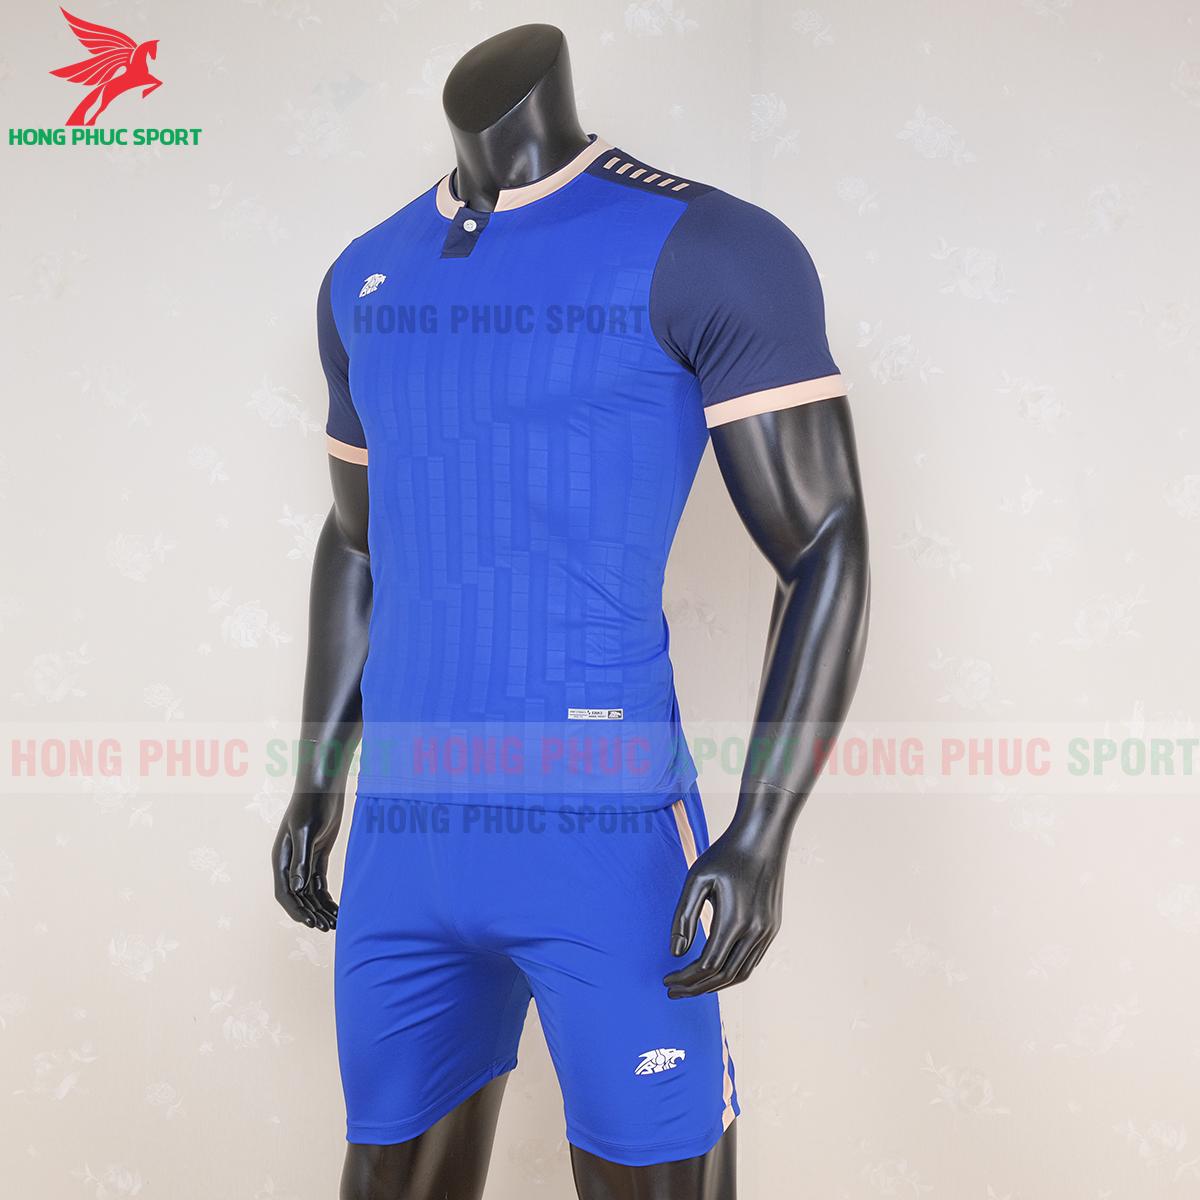 https://cdn.hongphucsport.com/unsafe/s4.shopbay.vn/files/285/ao-bong-da-khong-logo-riki-neck-xanh-duong-4-5f71afcedfd13.png